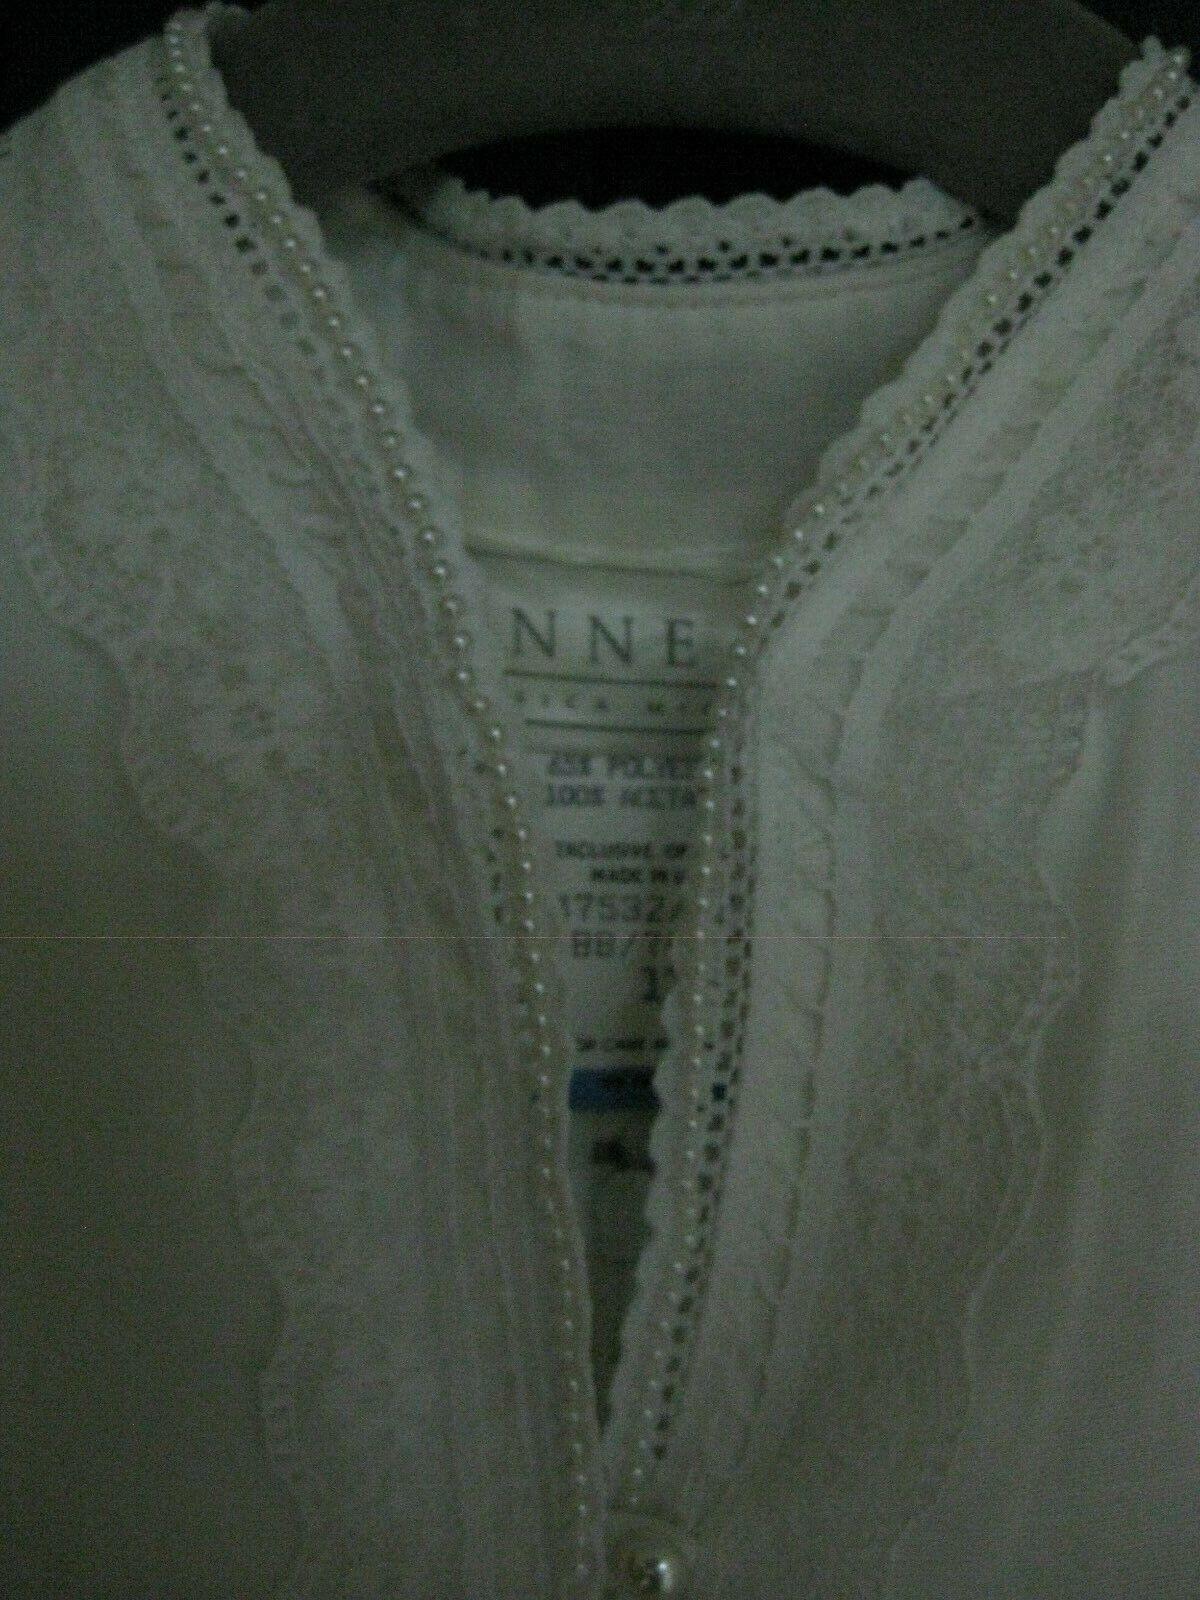 Gunne Sax White Dress Girls Size 12 Pre-Owned - image 2